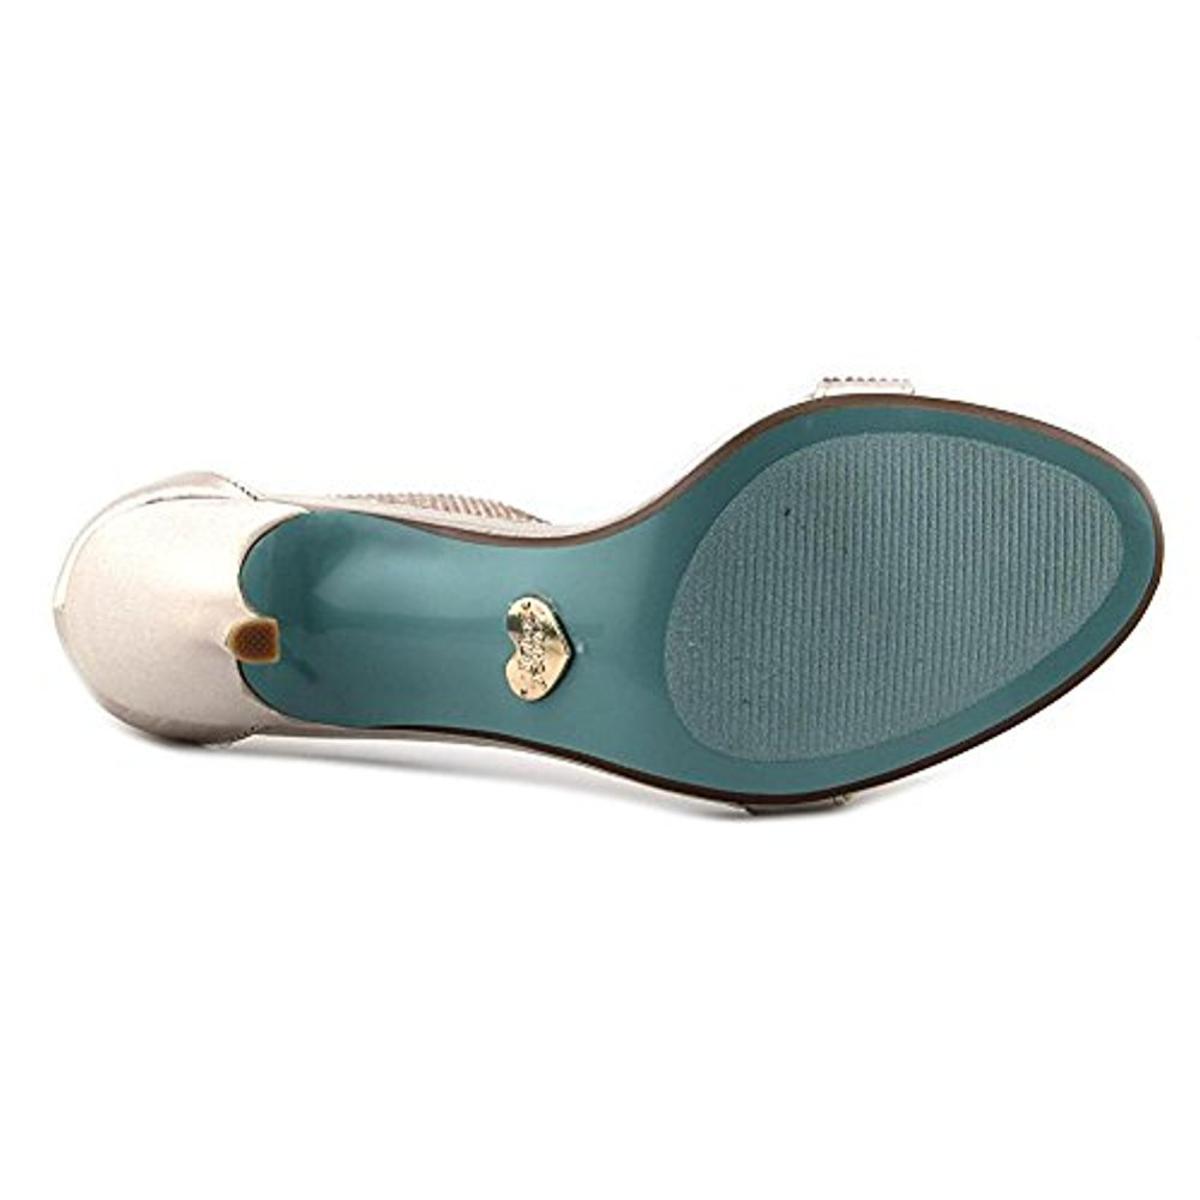 Blue-by-Betsey-Johnson-Womens-Shilo-Studded-Heels-Dress-Sandals-Shoes-BHFO-0493 thumbnail 8